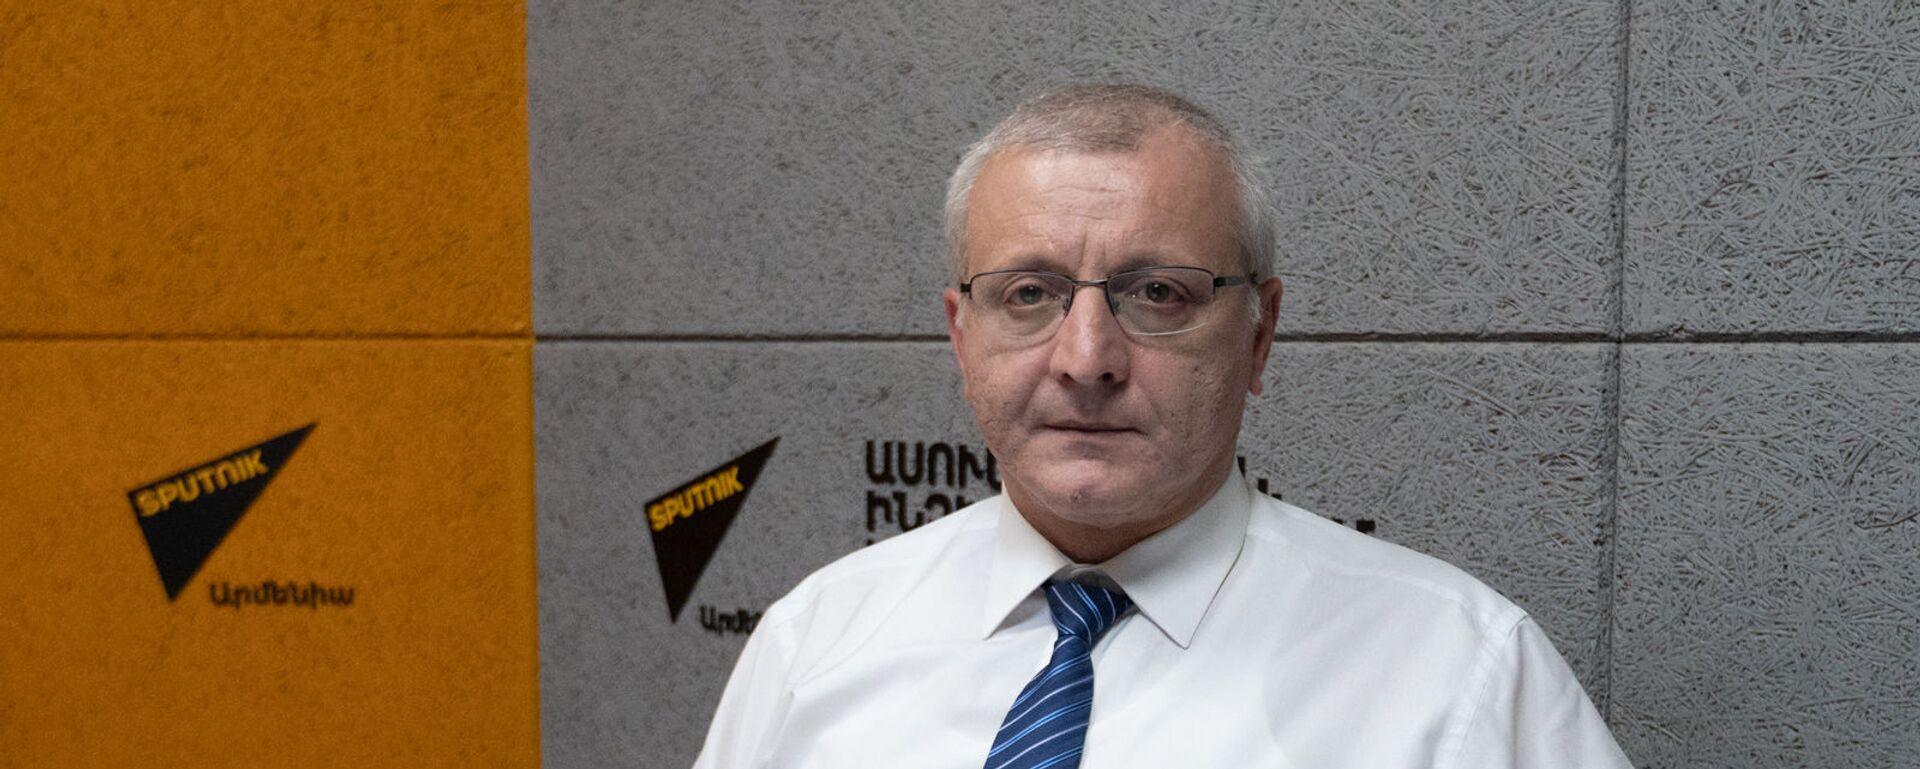 Политолог Сурен Суренянц в гостях радио Sputnik - Sputnik Արմենիա, 1920, 22.08.2021